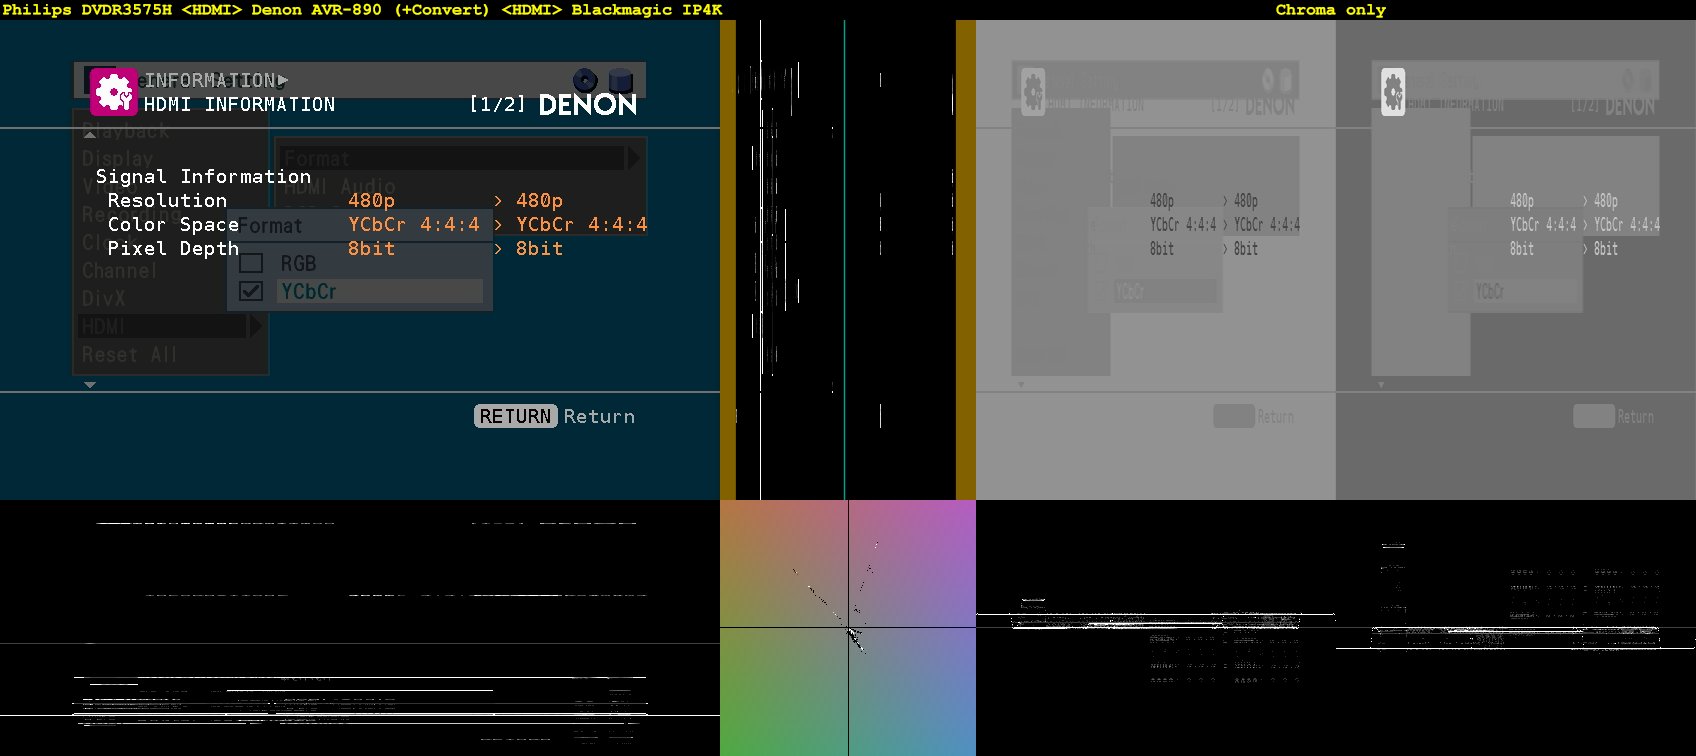 Click image for larger version  Name:Menu + Info - Philips DVDR3575H =HDMI= Denon AVR-890 (+Convert) =HDMI= Blackmagic IP4K.png Views:2359 Size:85.5 KB ID:37601